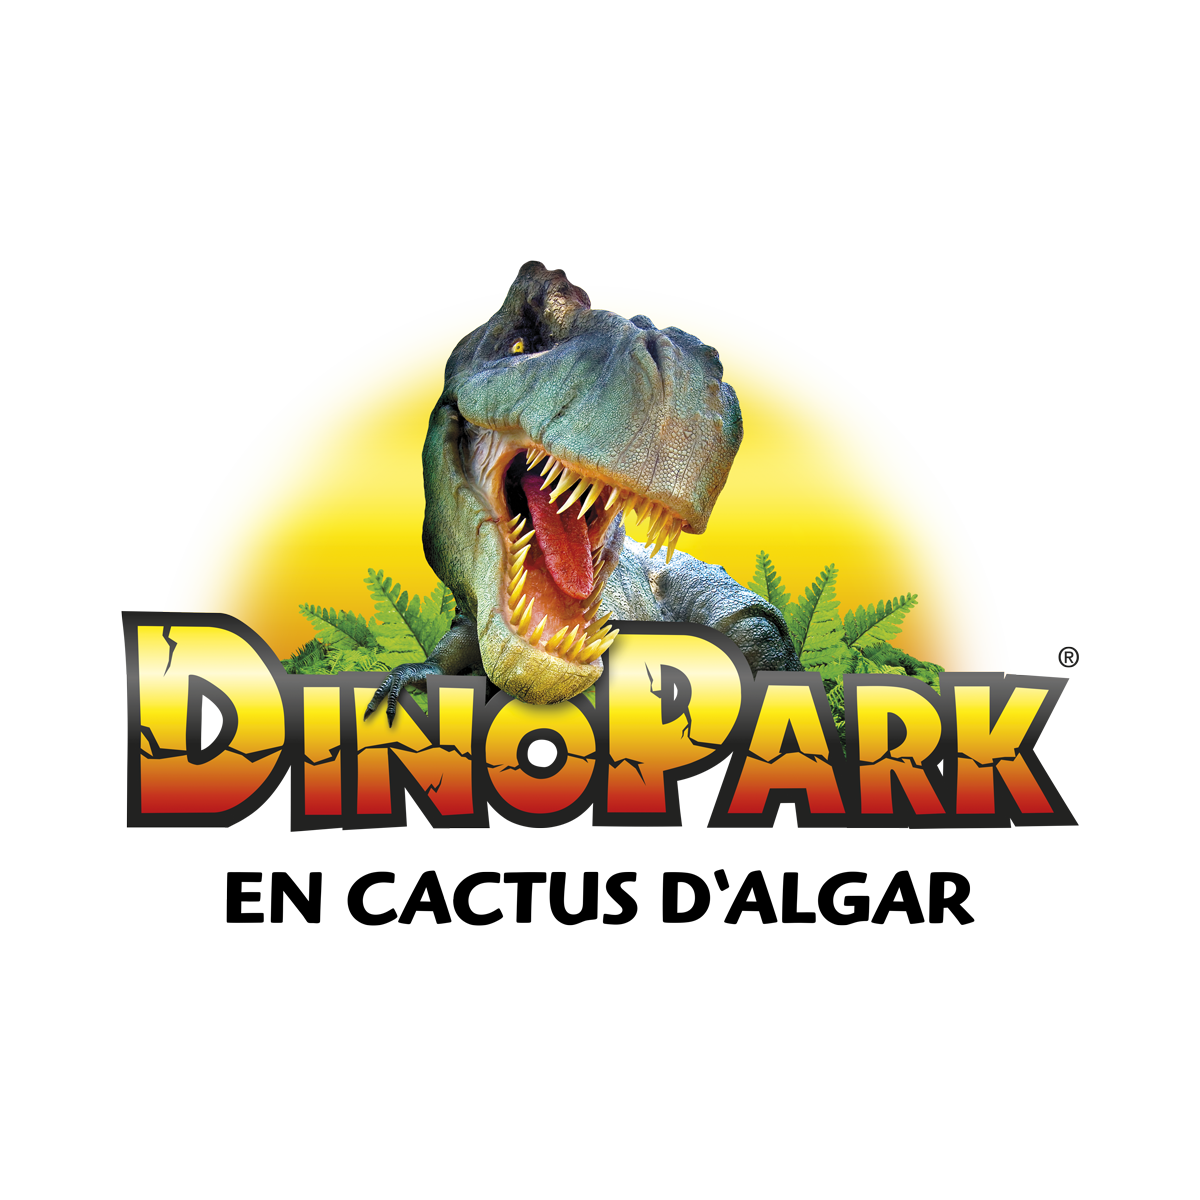 Dino Park Algar, novedades para esta temporada